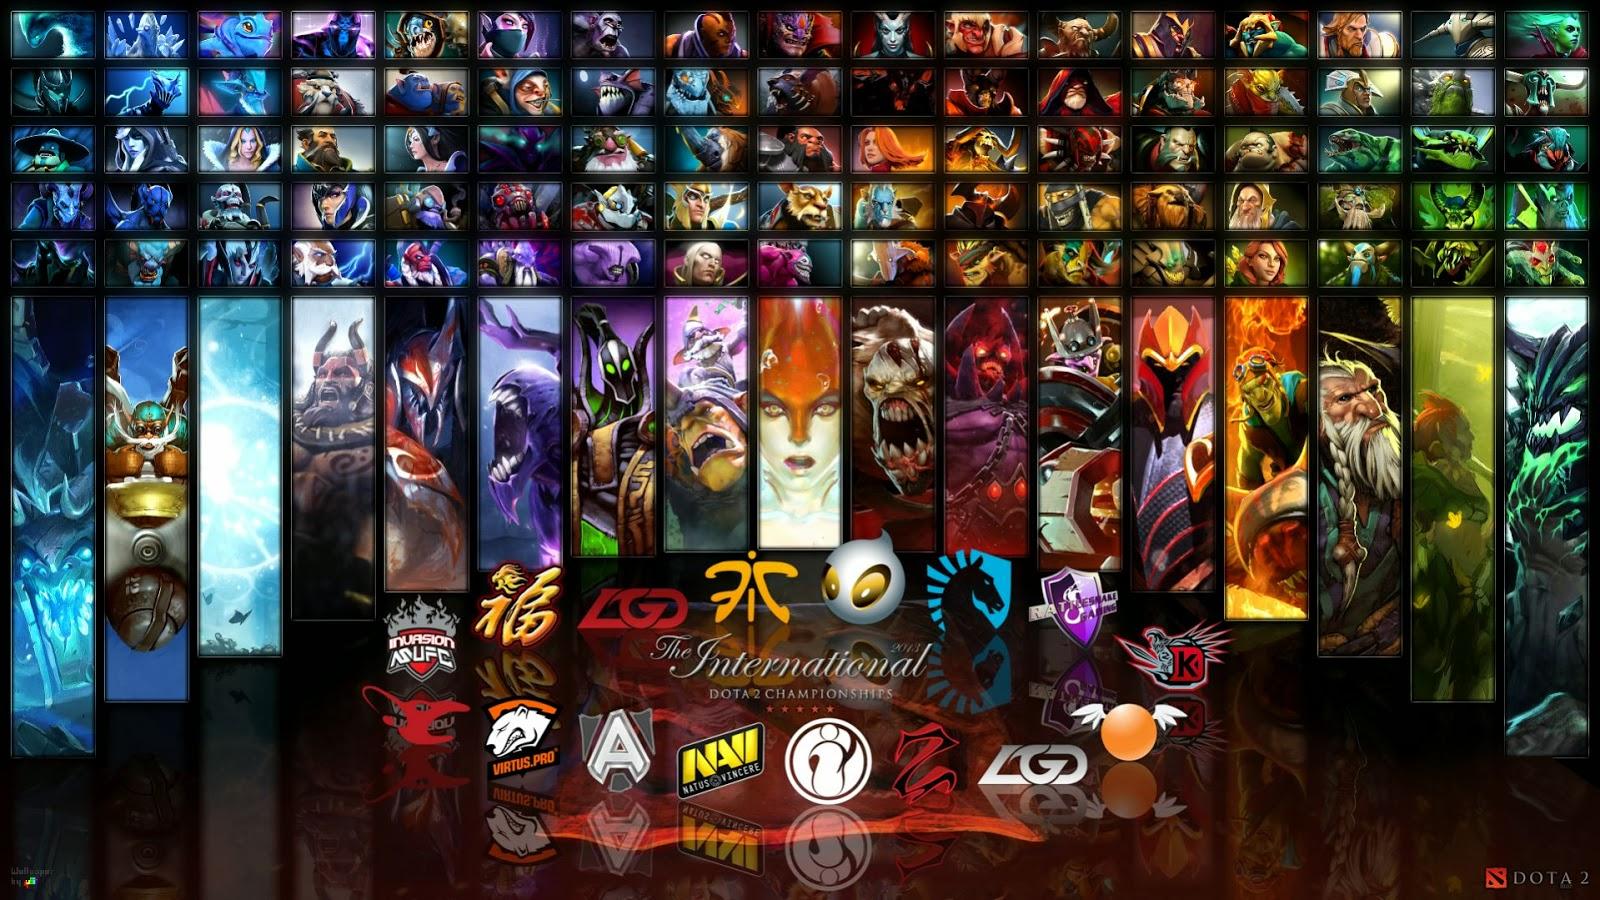 Dota 2 Wallpapers: Dota 2 Wallpaper - Heroes mix and teams